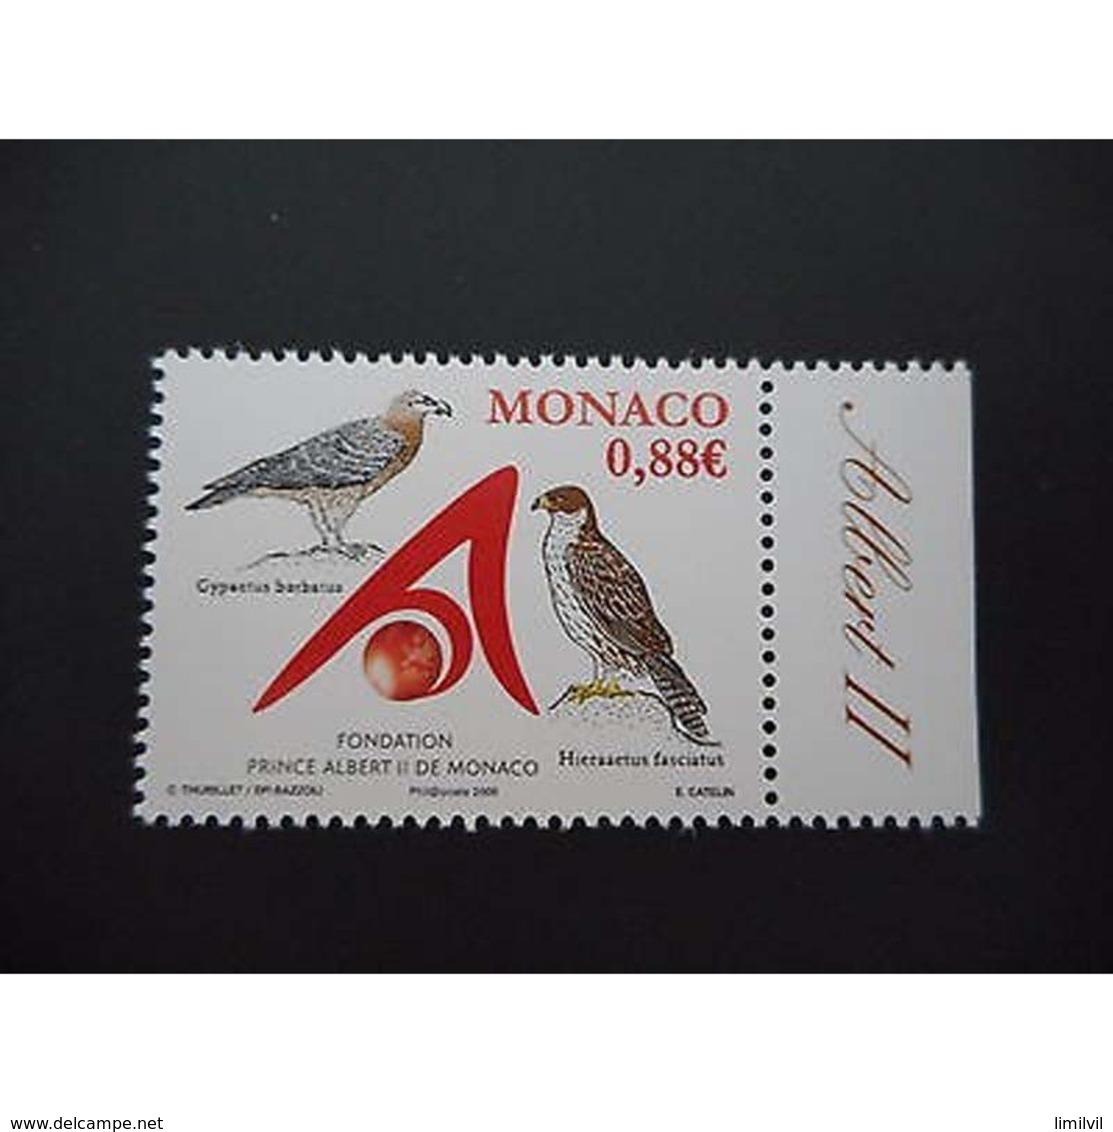 Timbre N° 2634 Neuf ** - Fondation Albert II De Monaco - Monaco